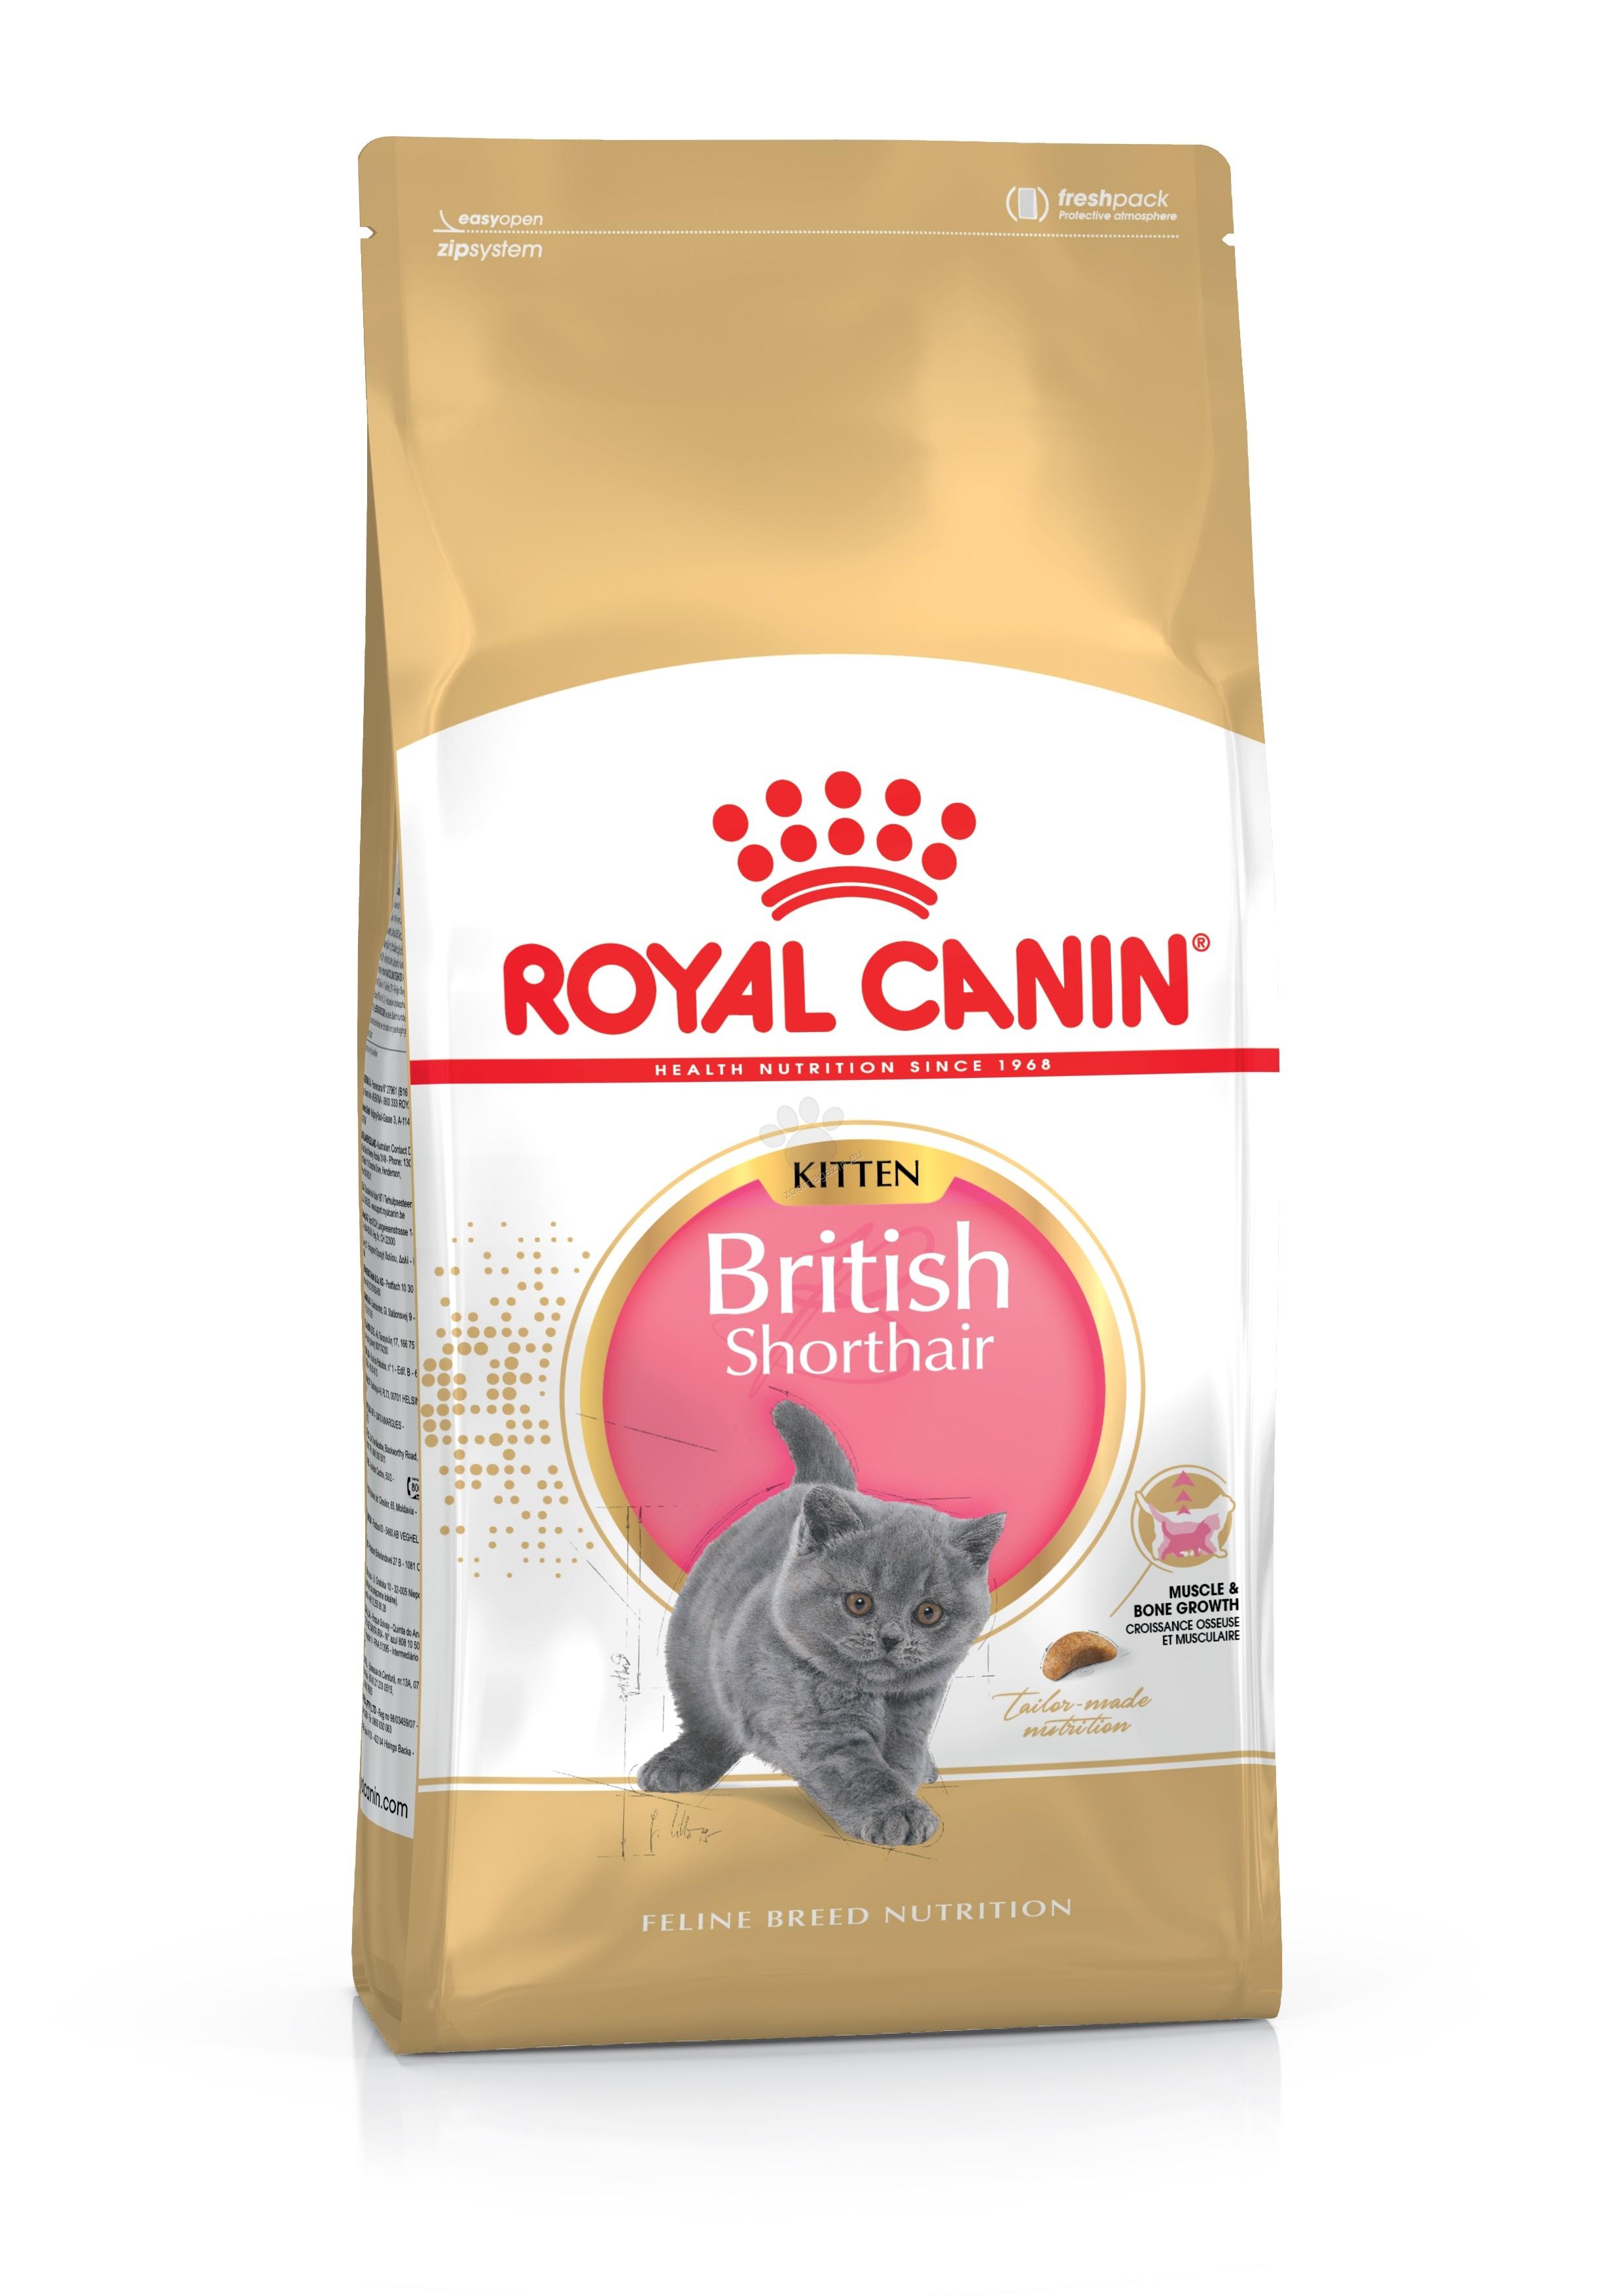 royal canin kitten british shorthair 4 12 400. Black Bedroom Furniture Sets. Home Design Ideas